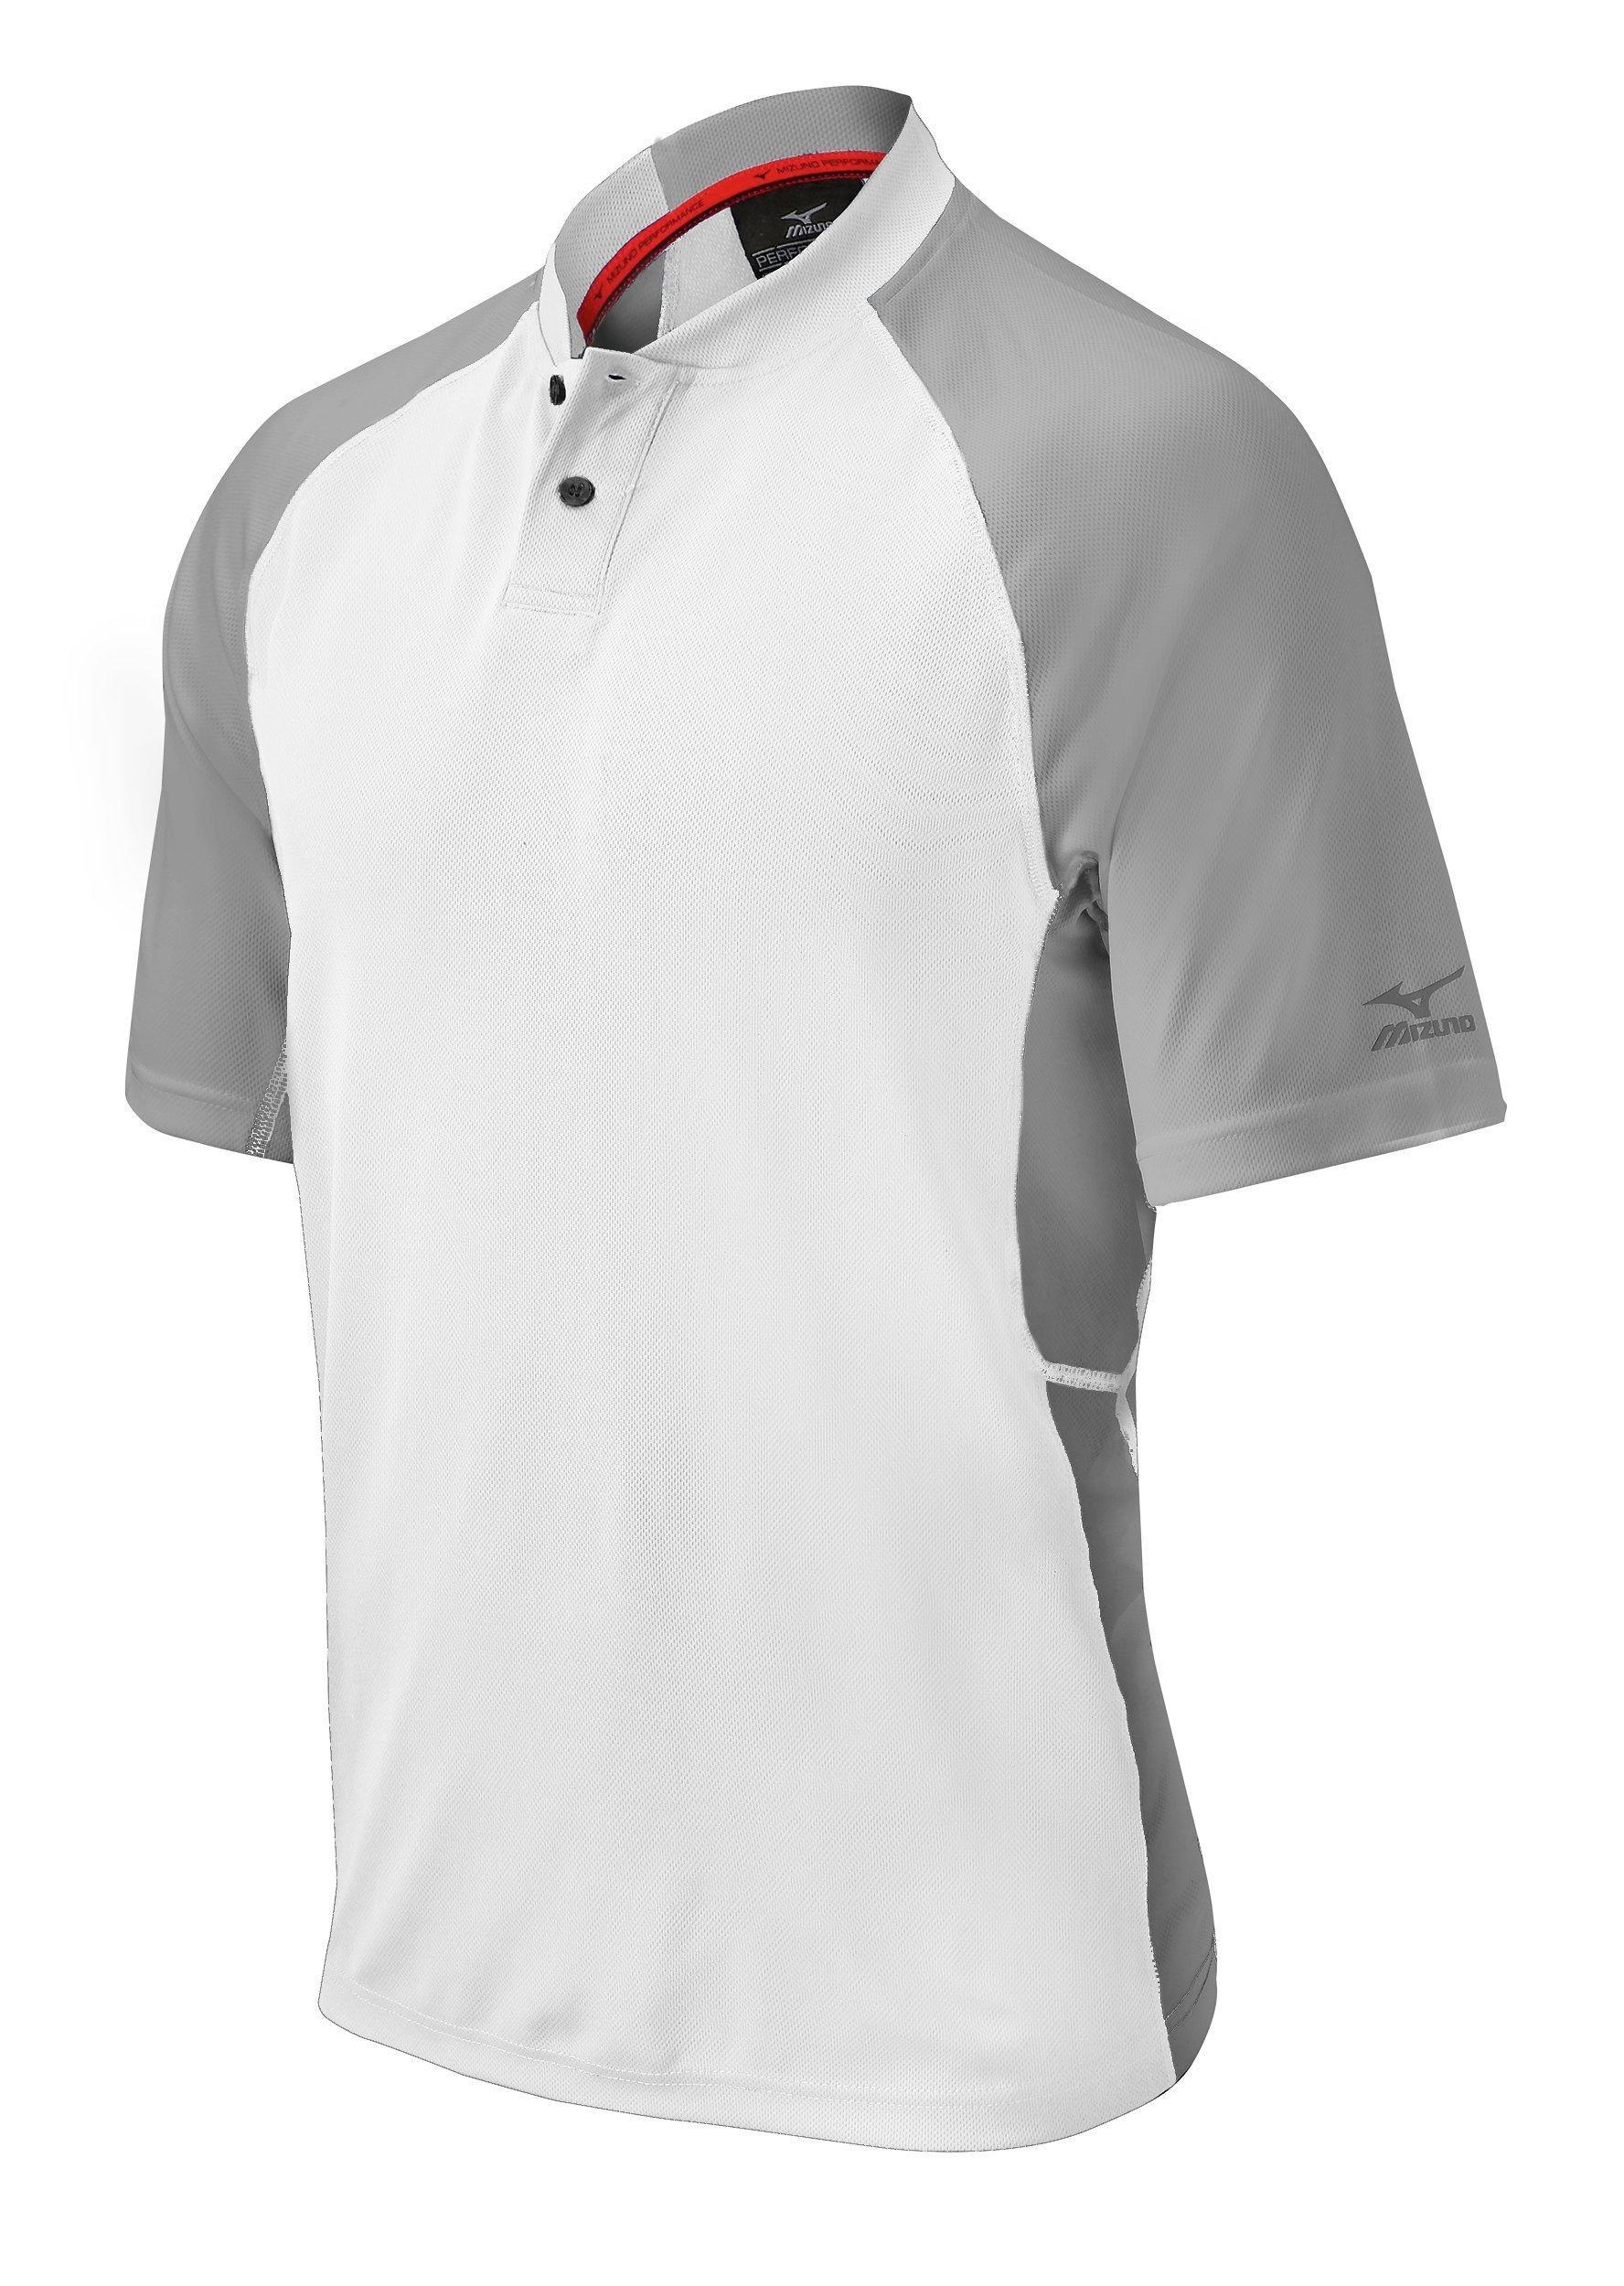 Mizuno Pro 2-Button Jersey